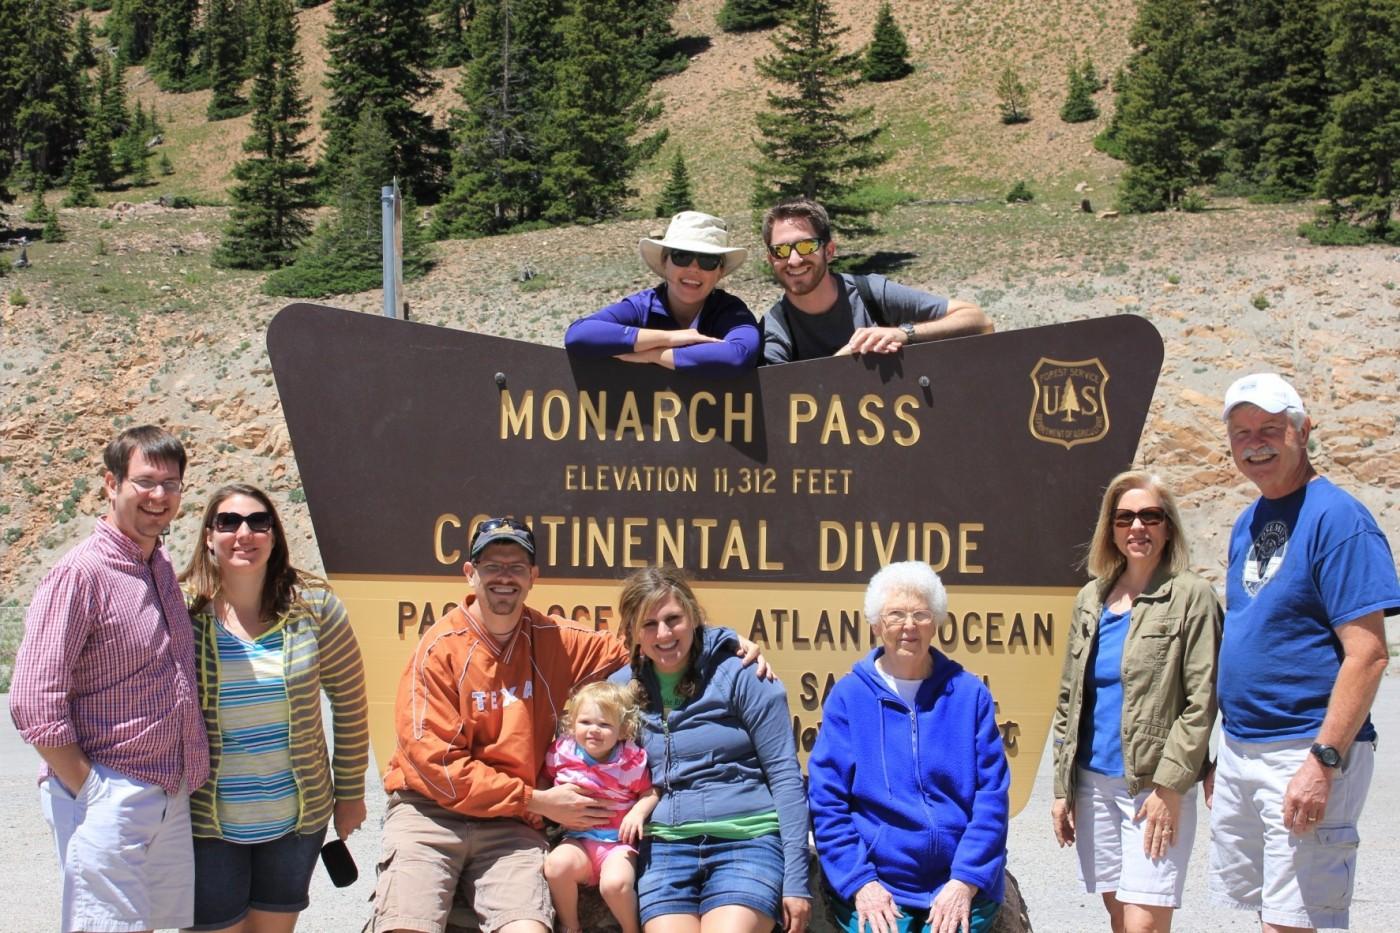 monarch pass, continental divide, whits wilderness, bill klenzendorf